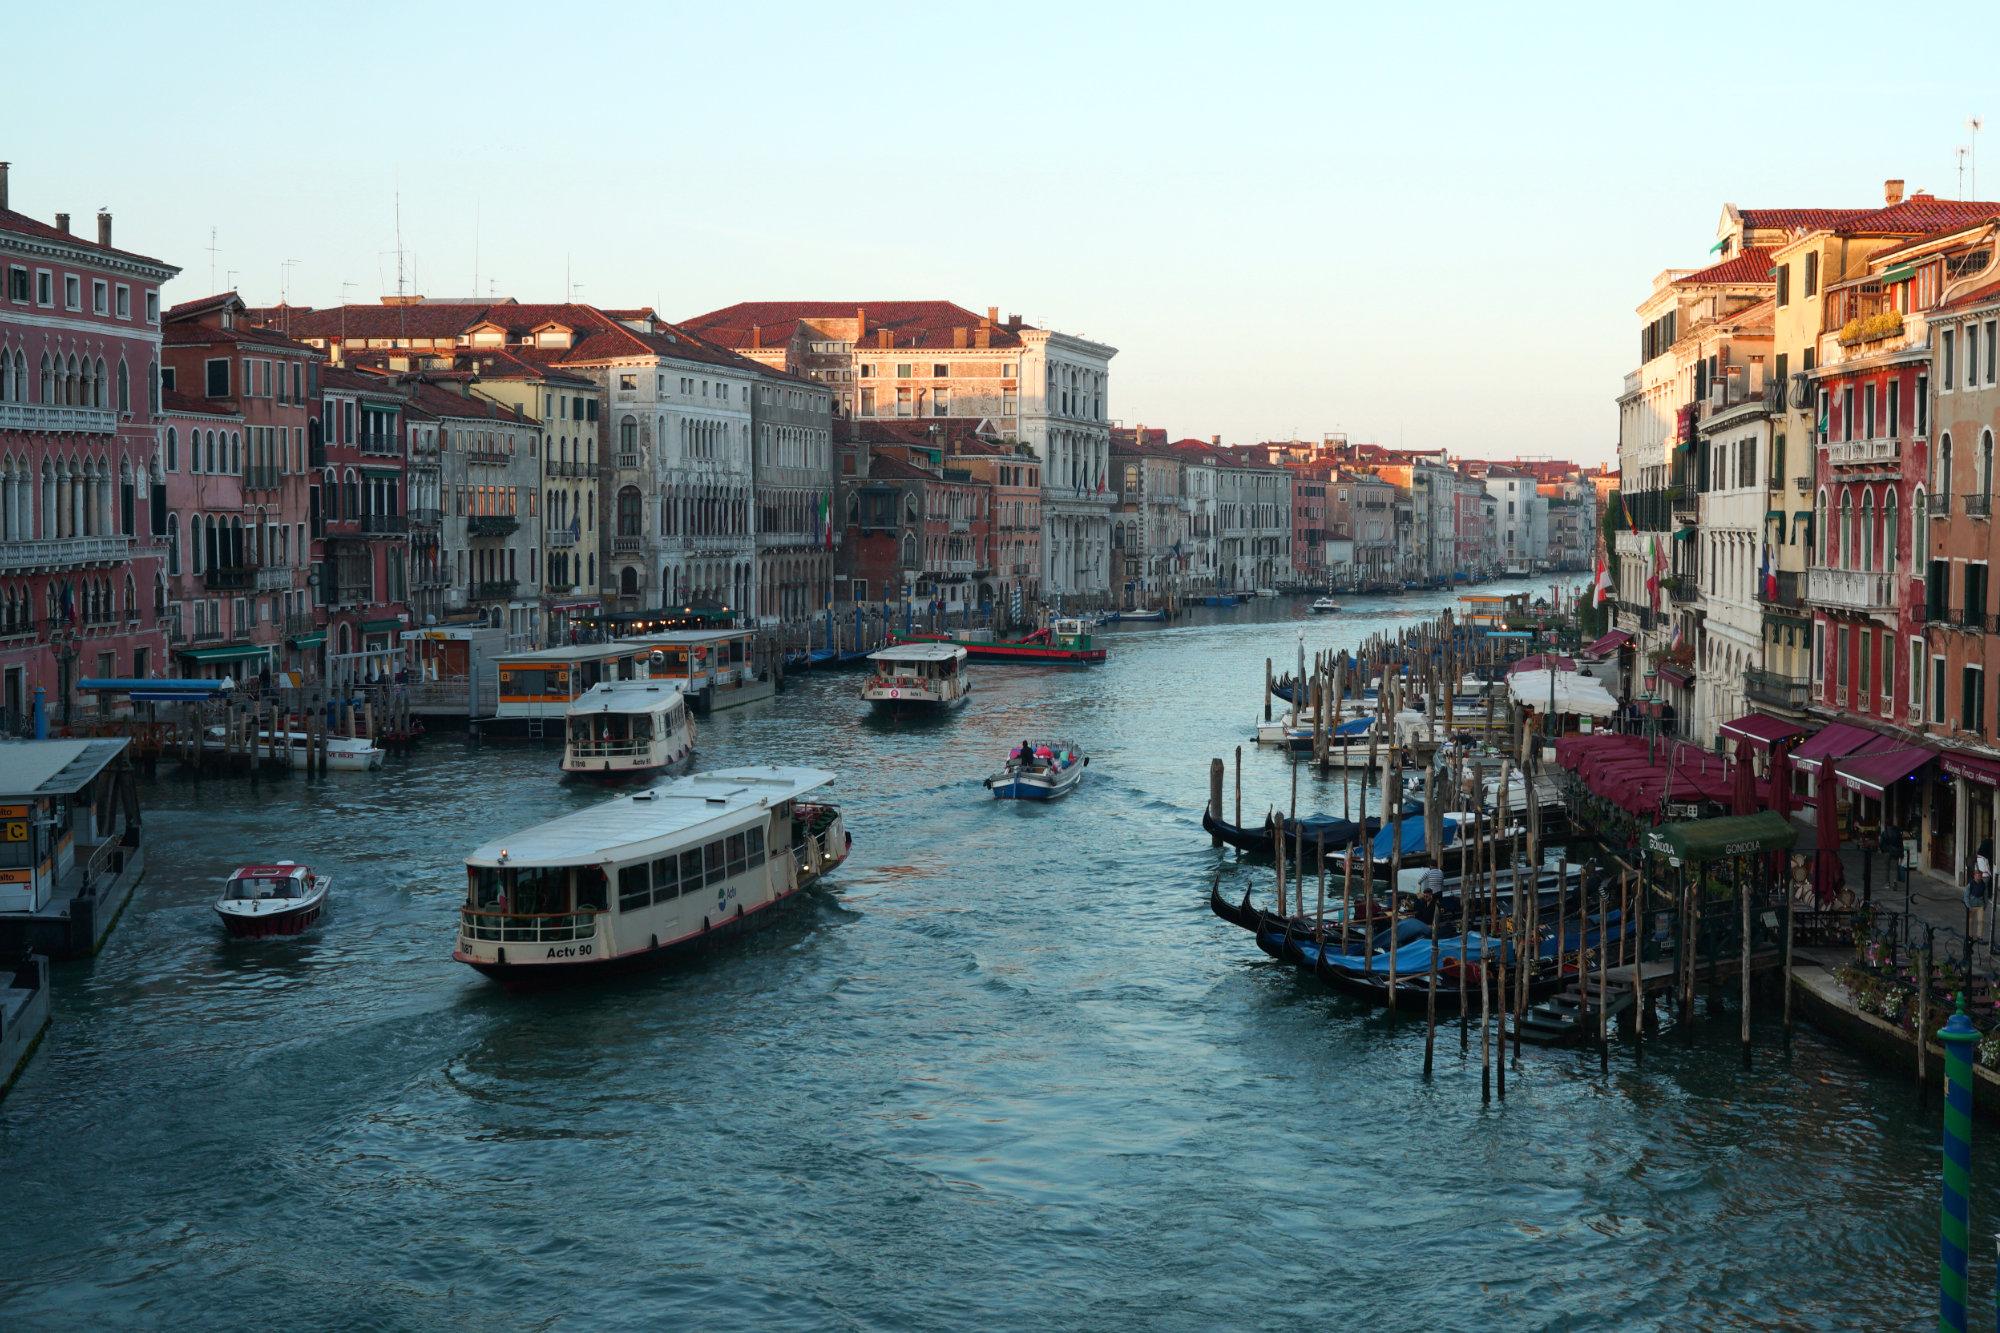 Venedig Canal Grande Valporetto